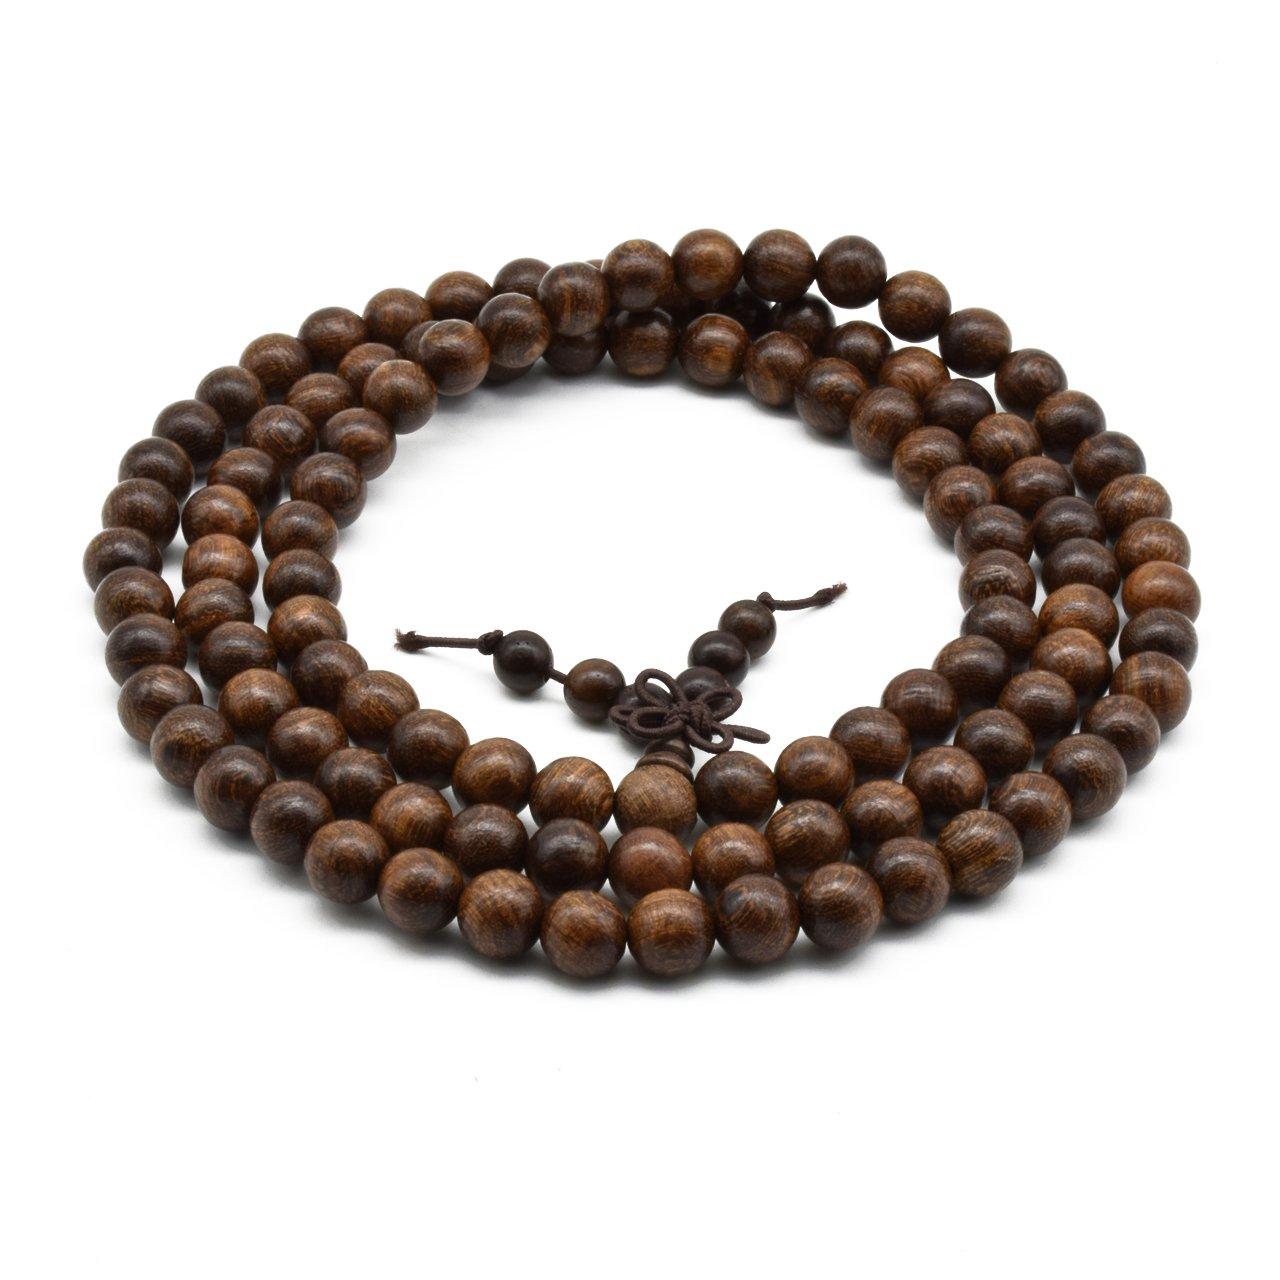 Zen Dear Unisex Natural Silkwood Tibetan Buddhism Meditation Prayer Bead Necklace Japa Mala Beads Bracelets